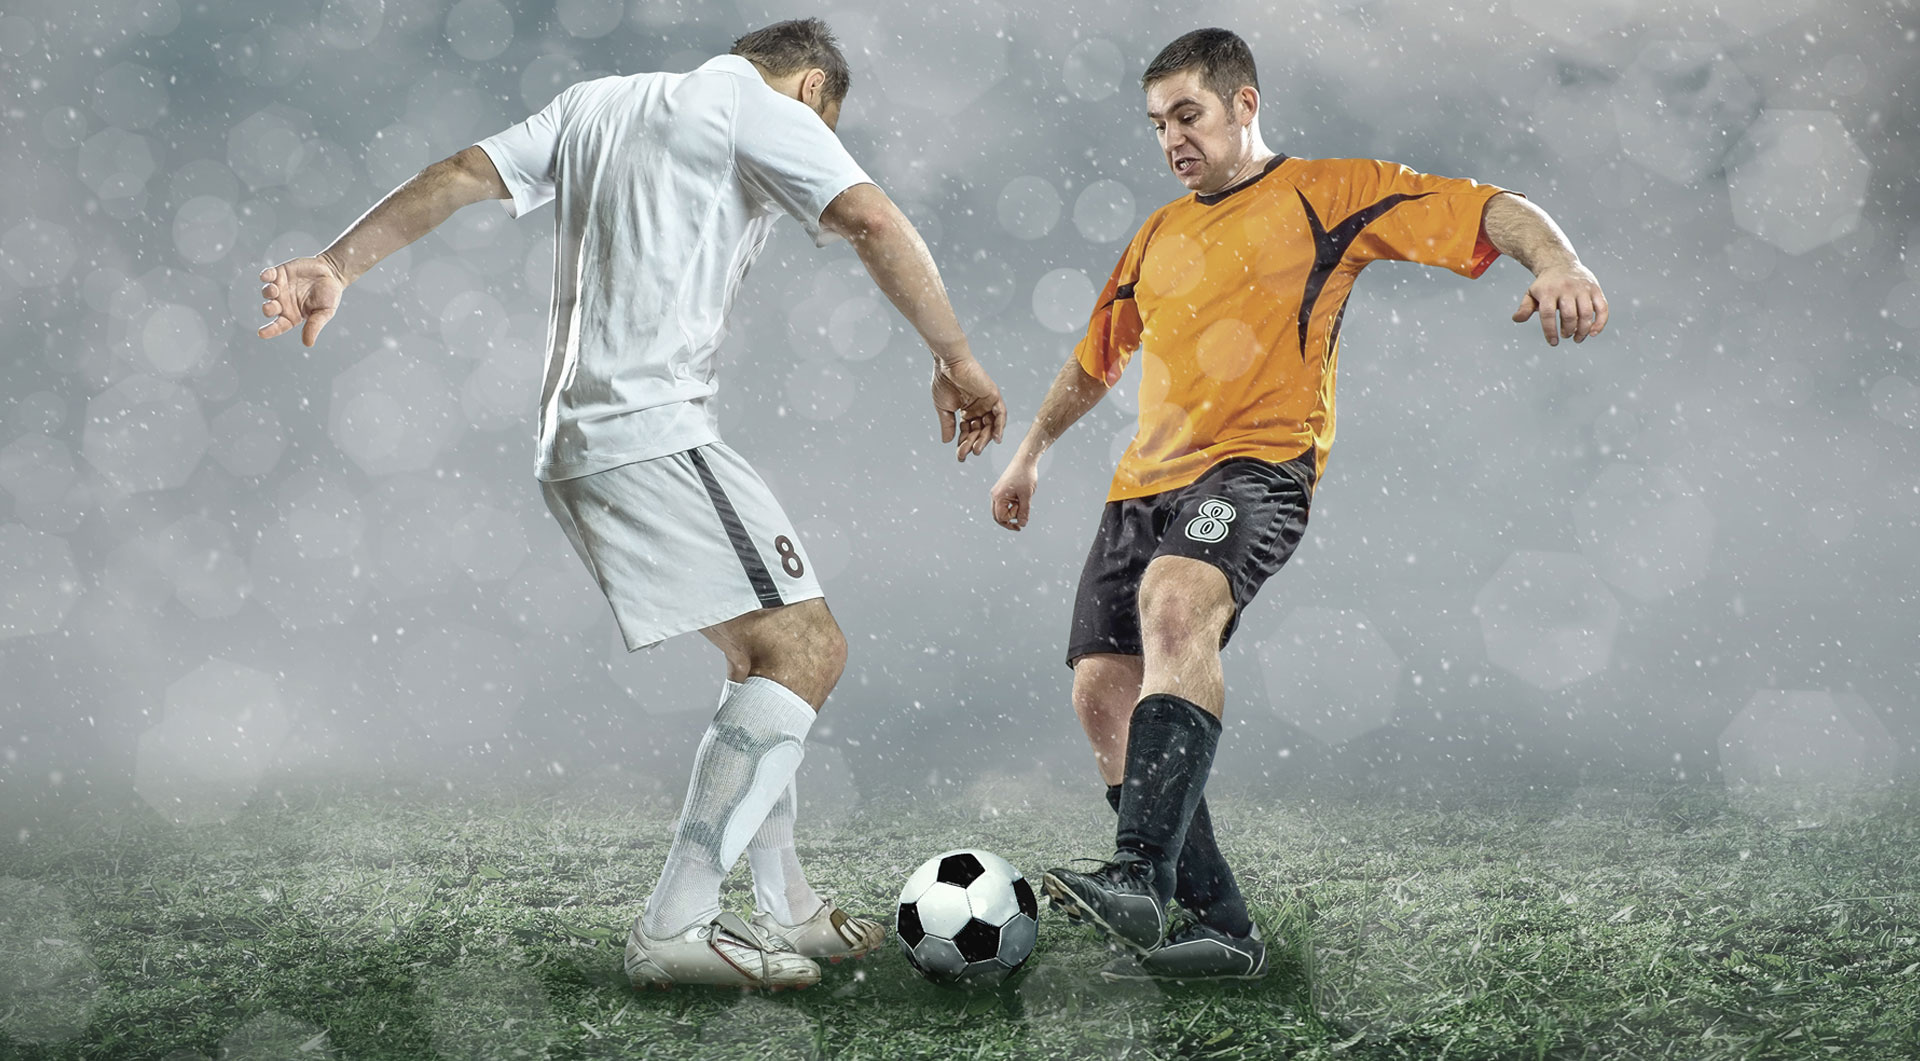 watch-johanna-larsson-vs-jelena-jankovic-us-open-round-3-online